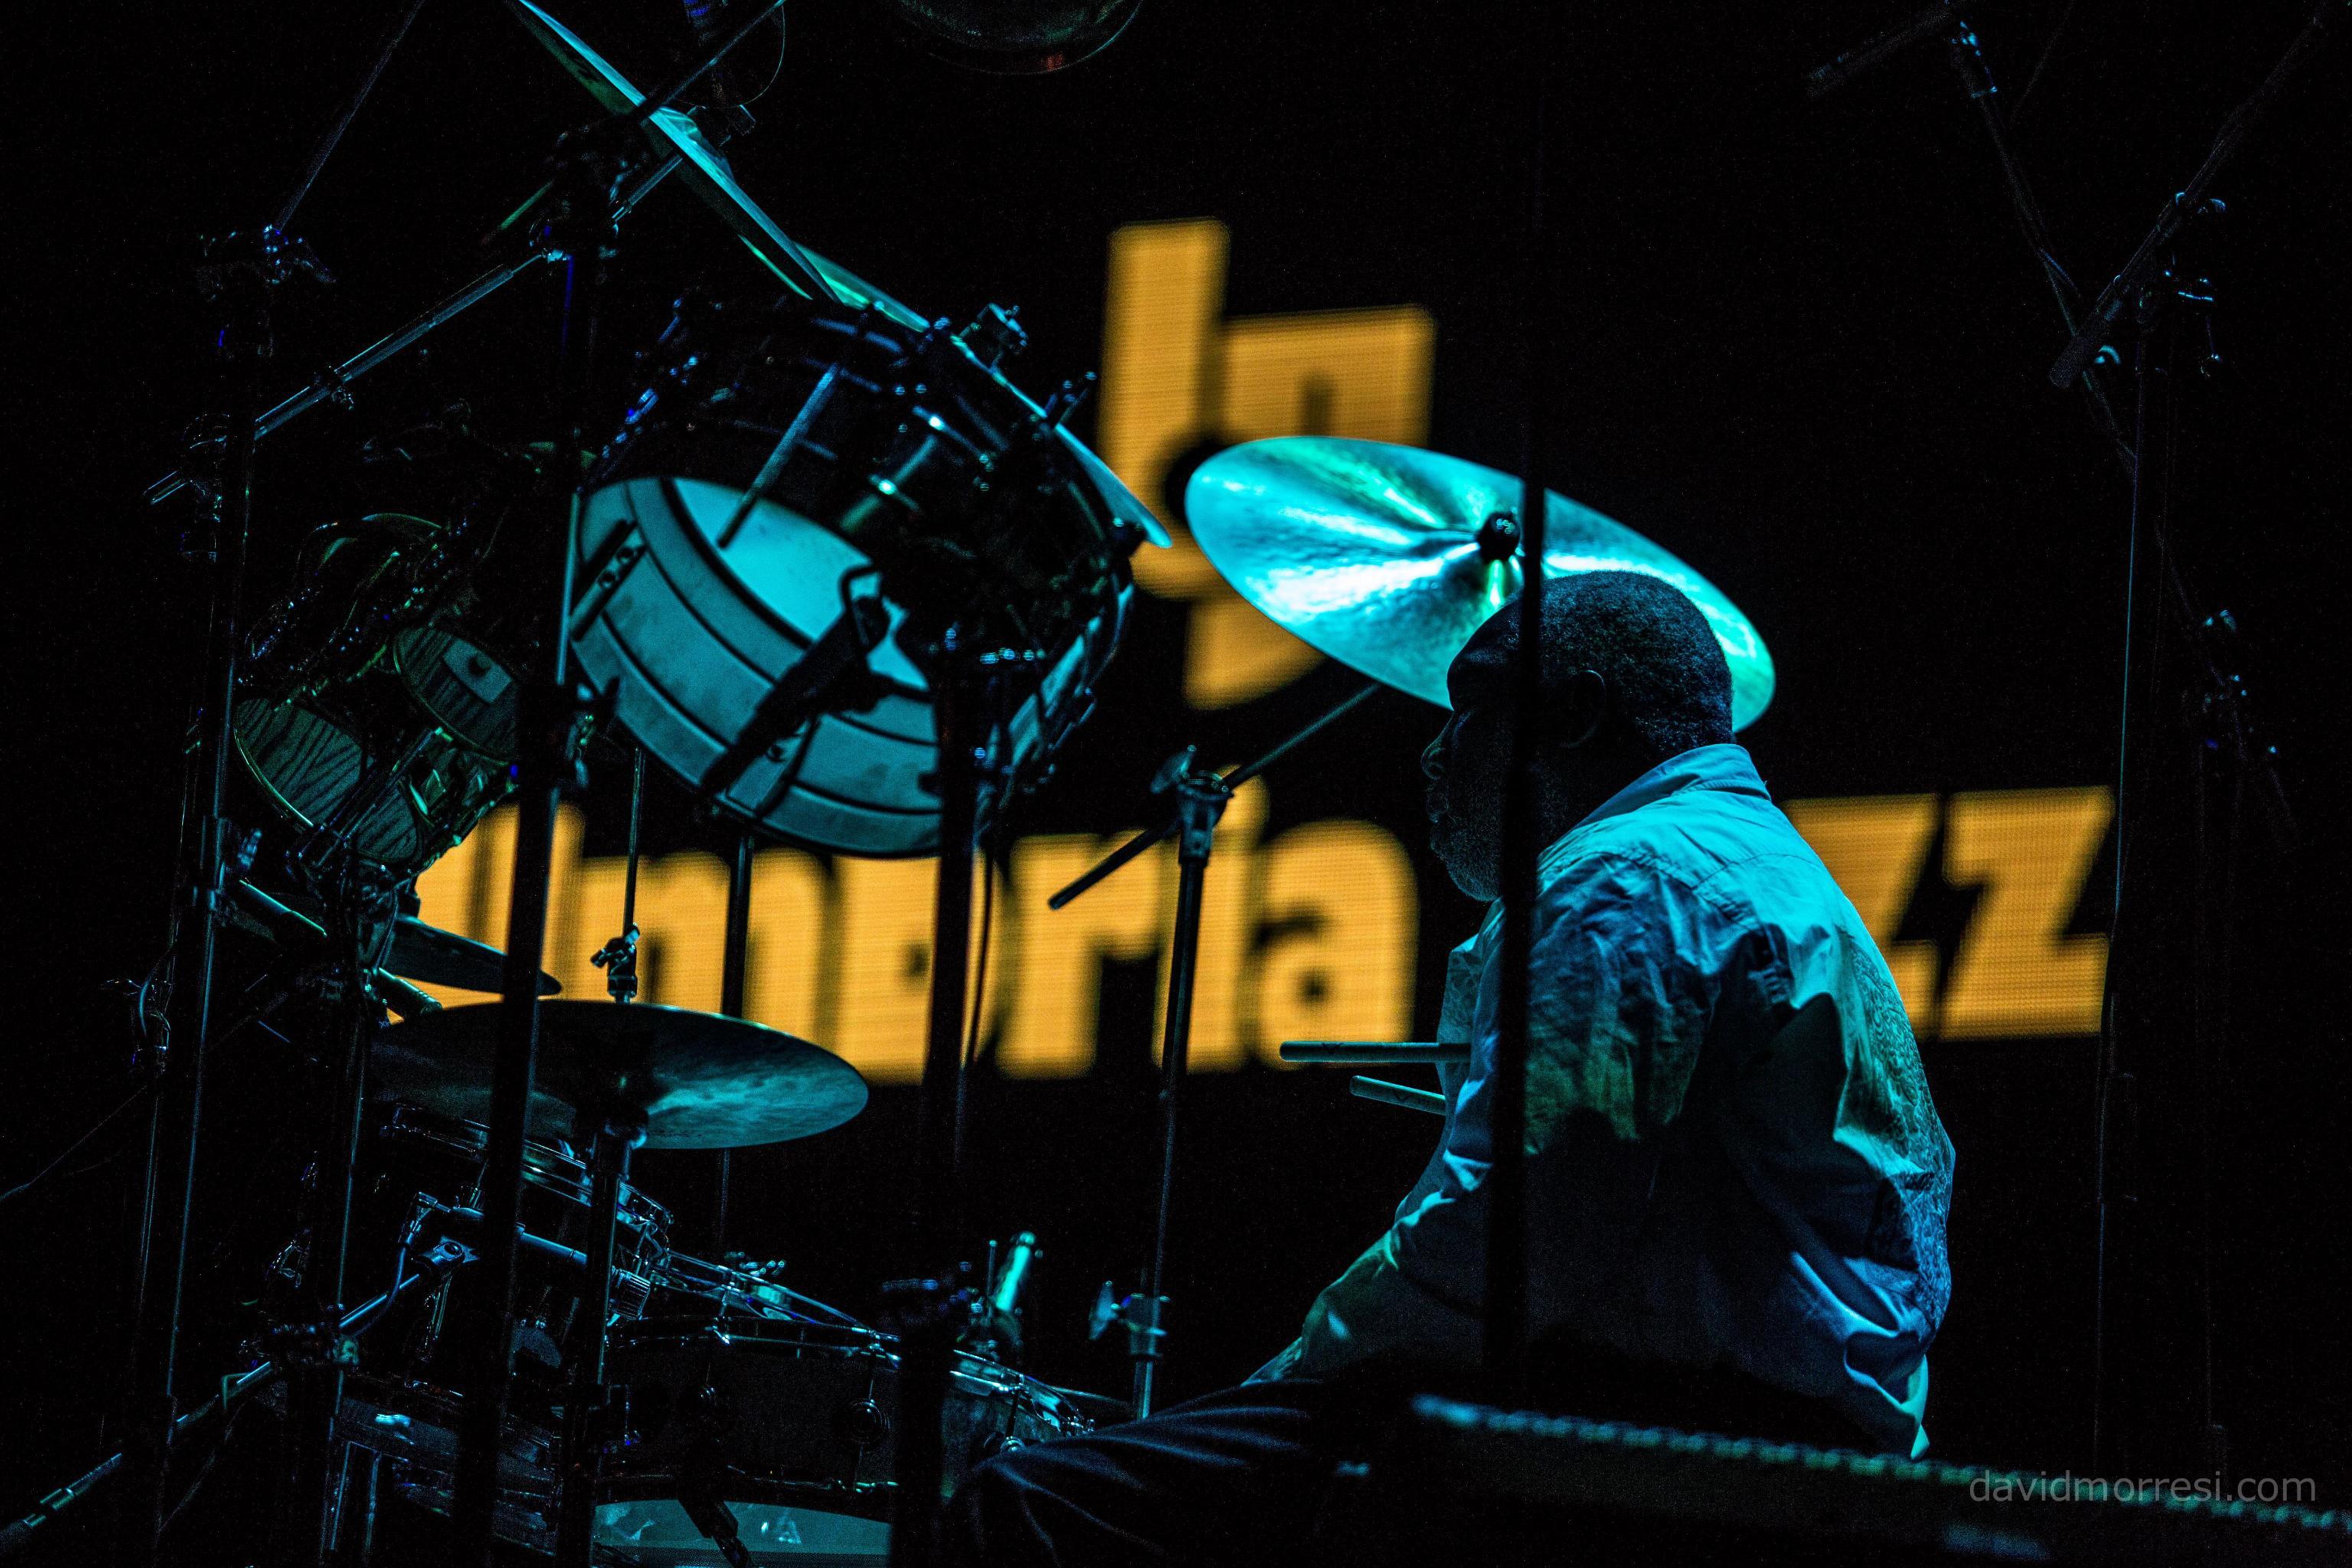 1 mln euro a Umbria Jazz,passa 'leggina'